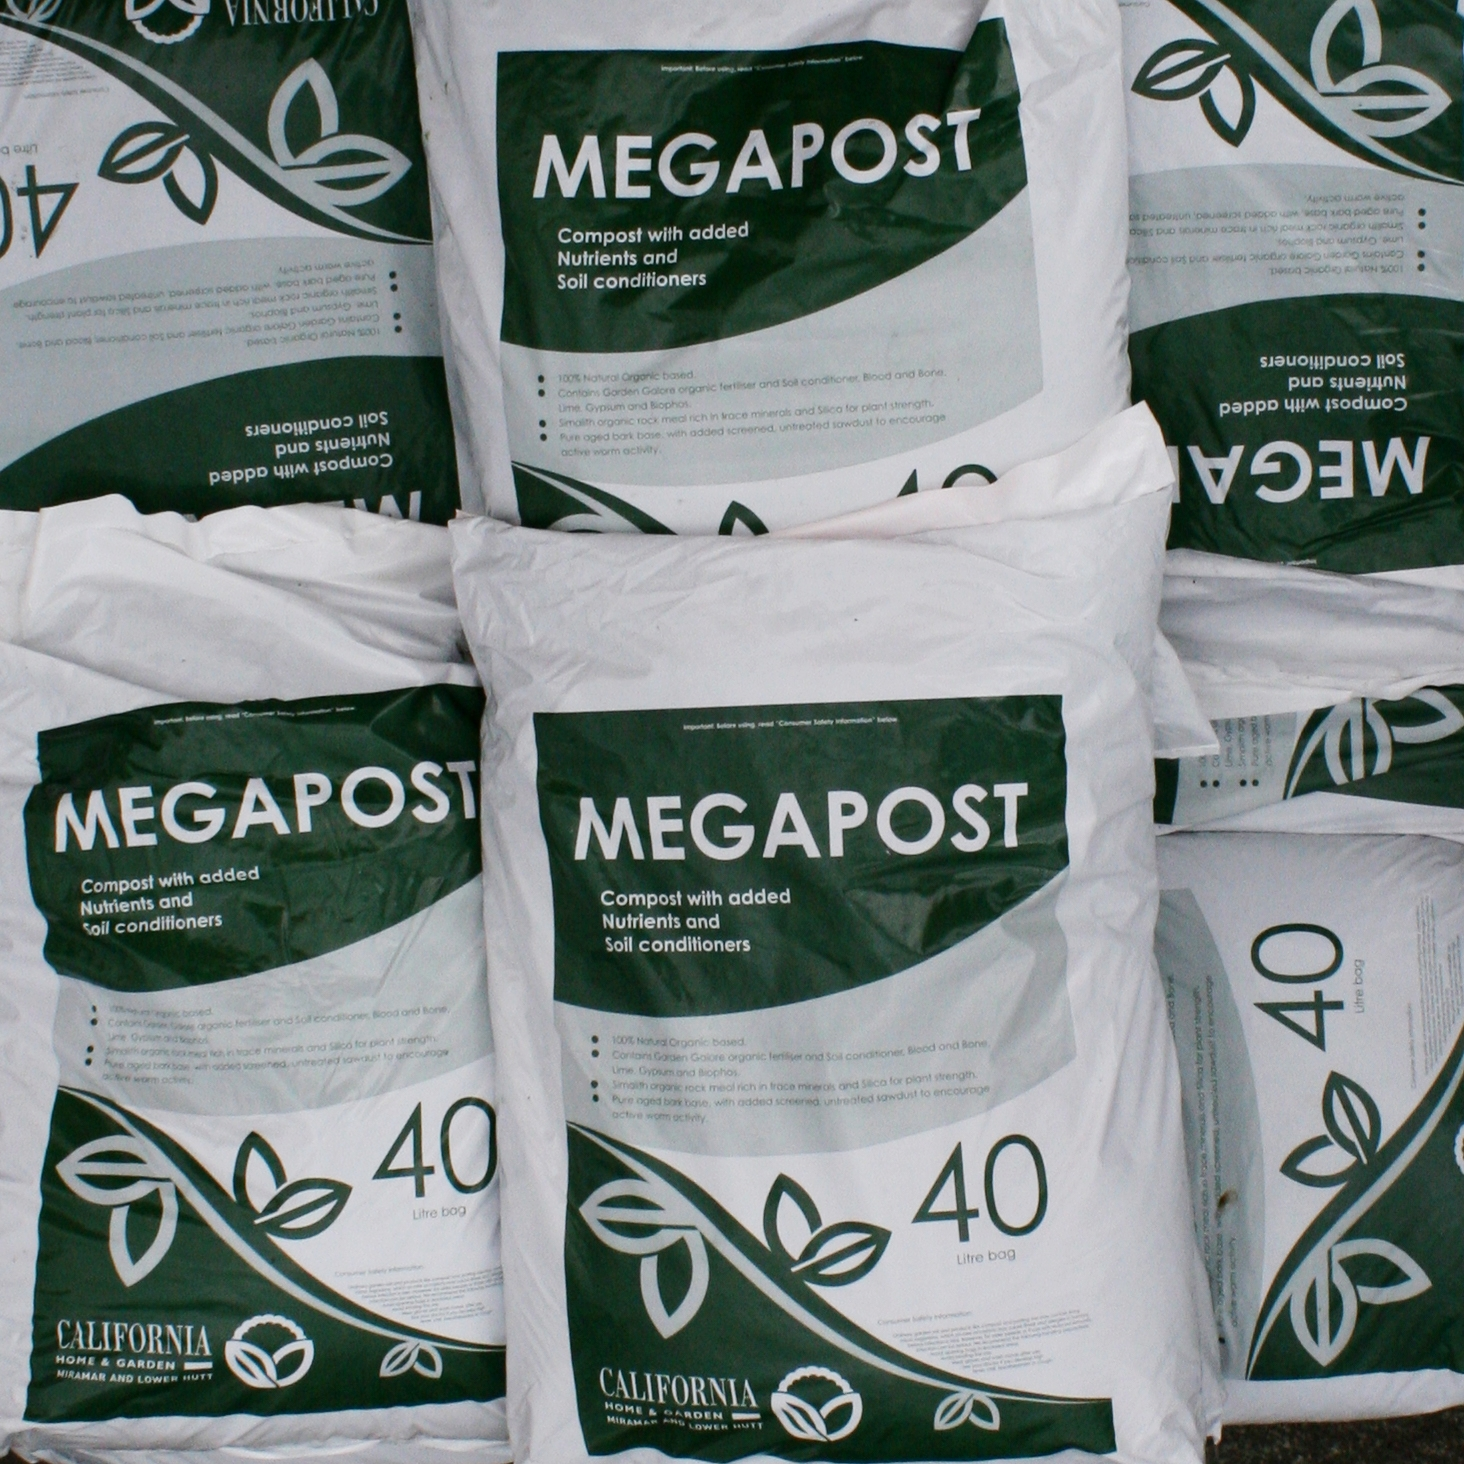 California Megapost 40L2 for $27 -